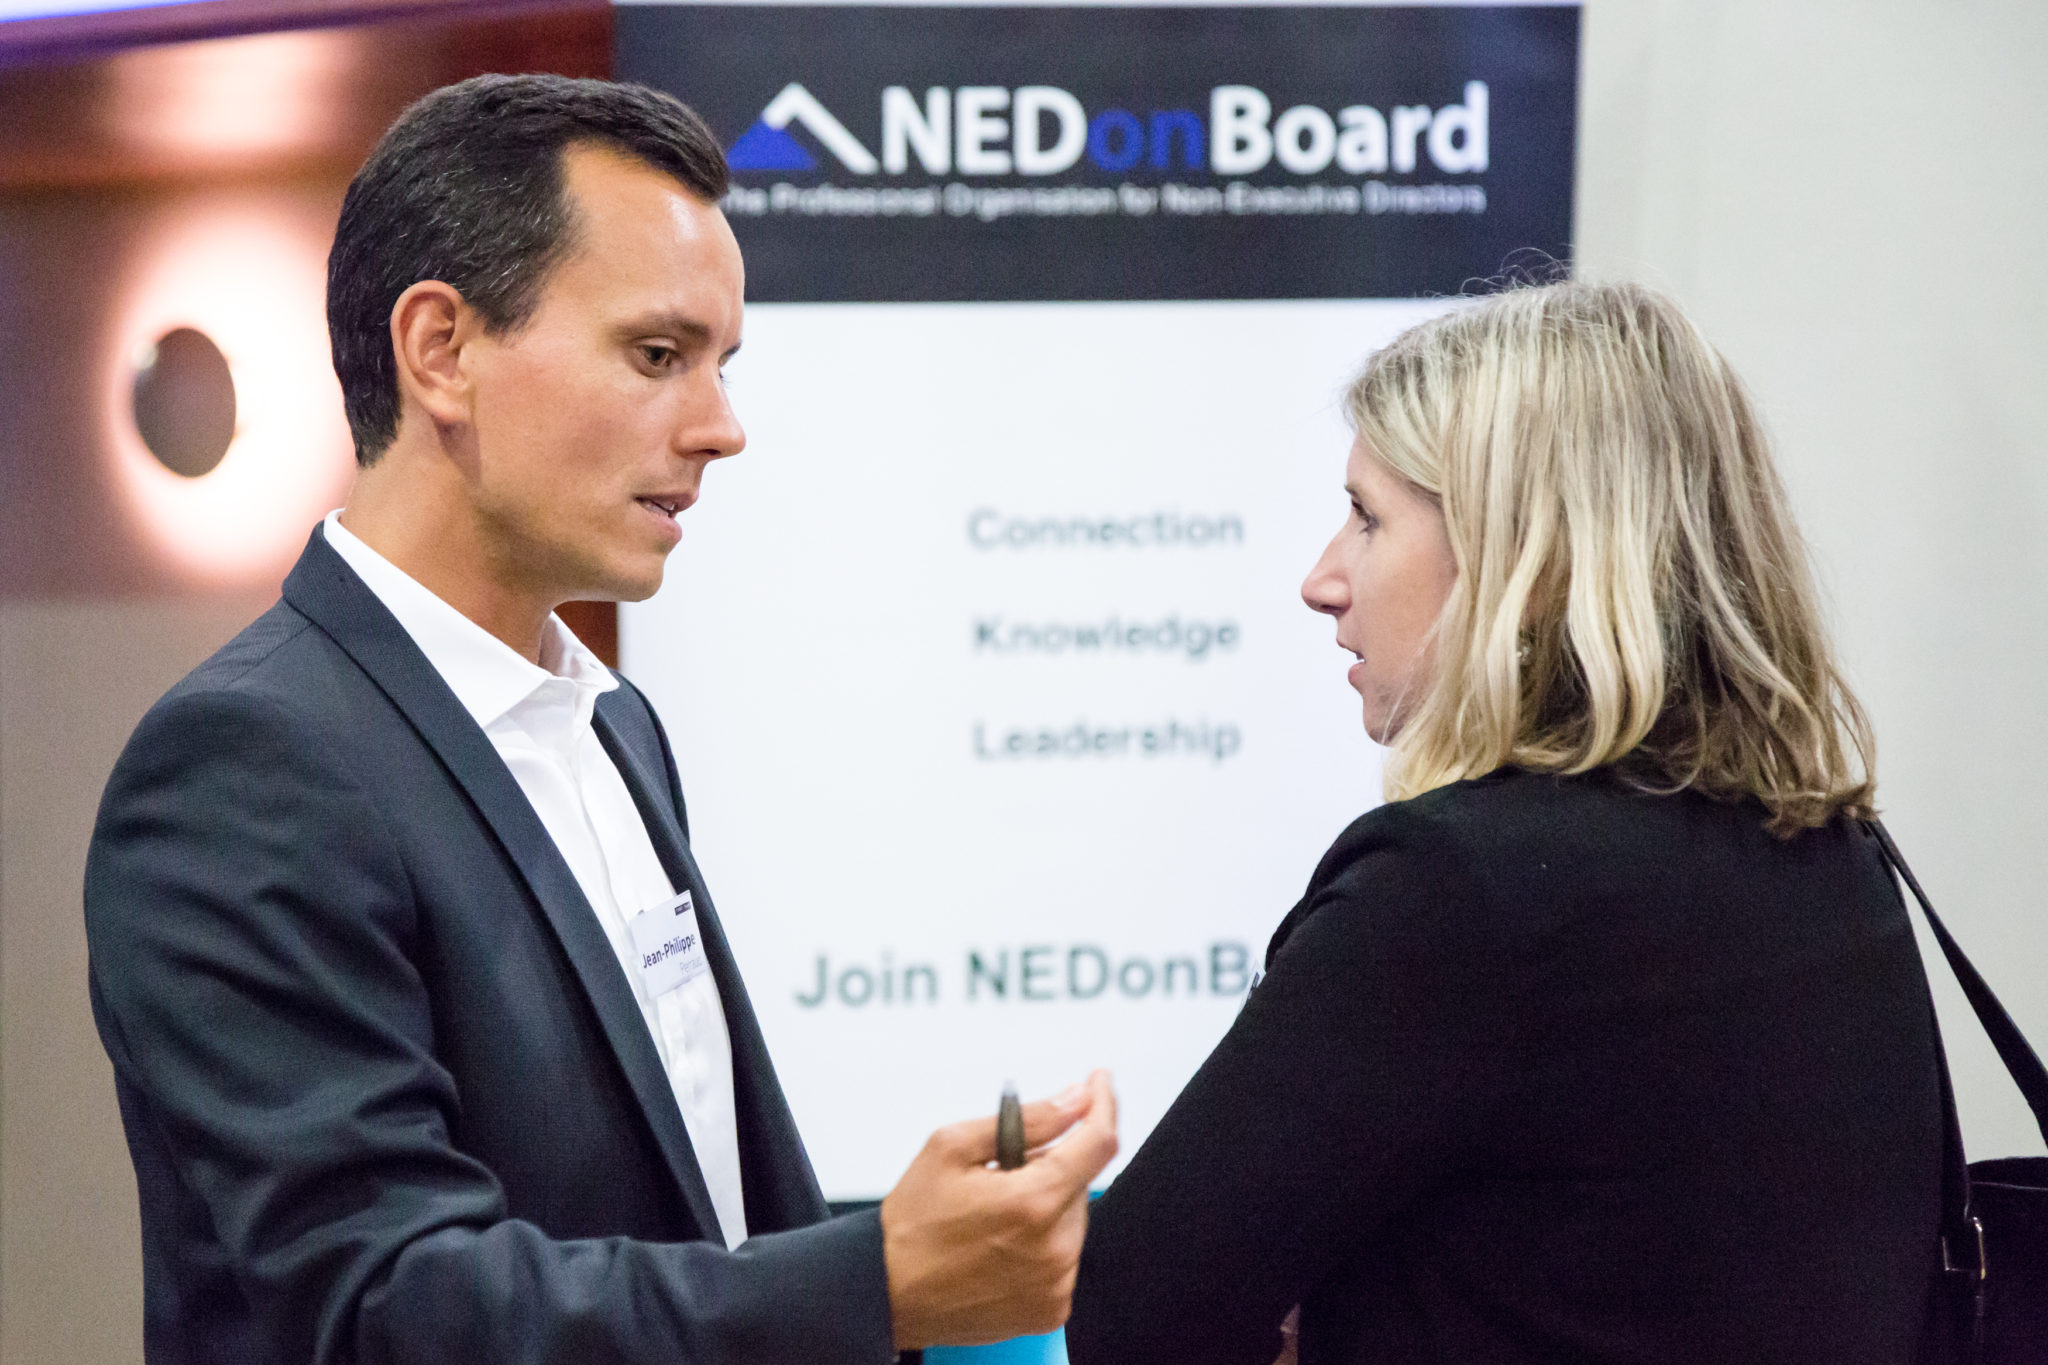 Mitigating risks at board's level – ecoDa/AIG webinar